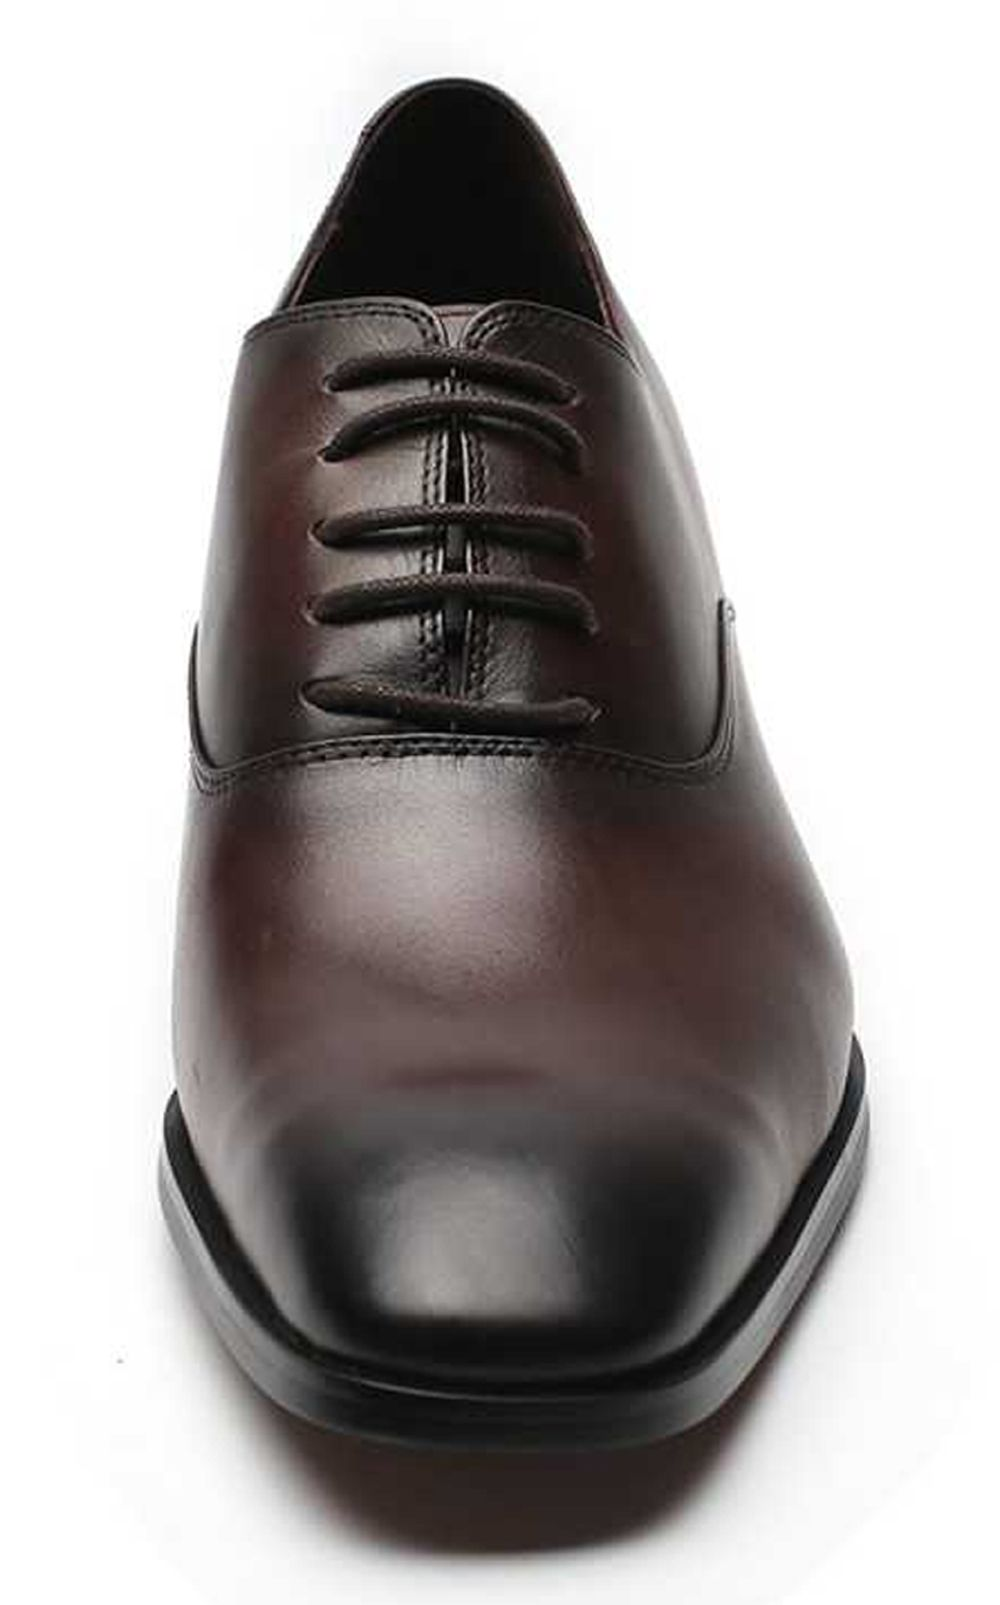 Faretti Paolo Podwyzszajace Buty Meskie Skorzane 7 Cm Eleganckie Do Slubu Biznesu Dress Shoes Men Dress Shoes Oxford Shoes